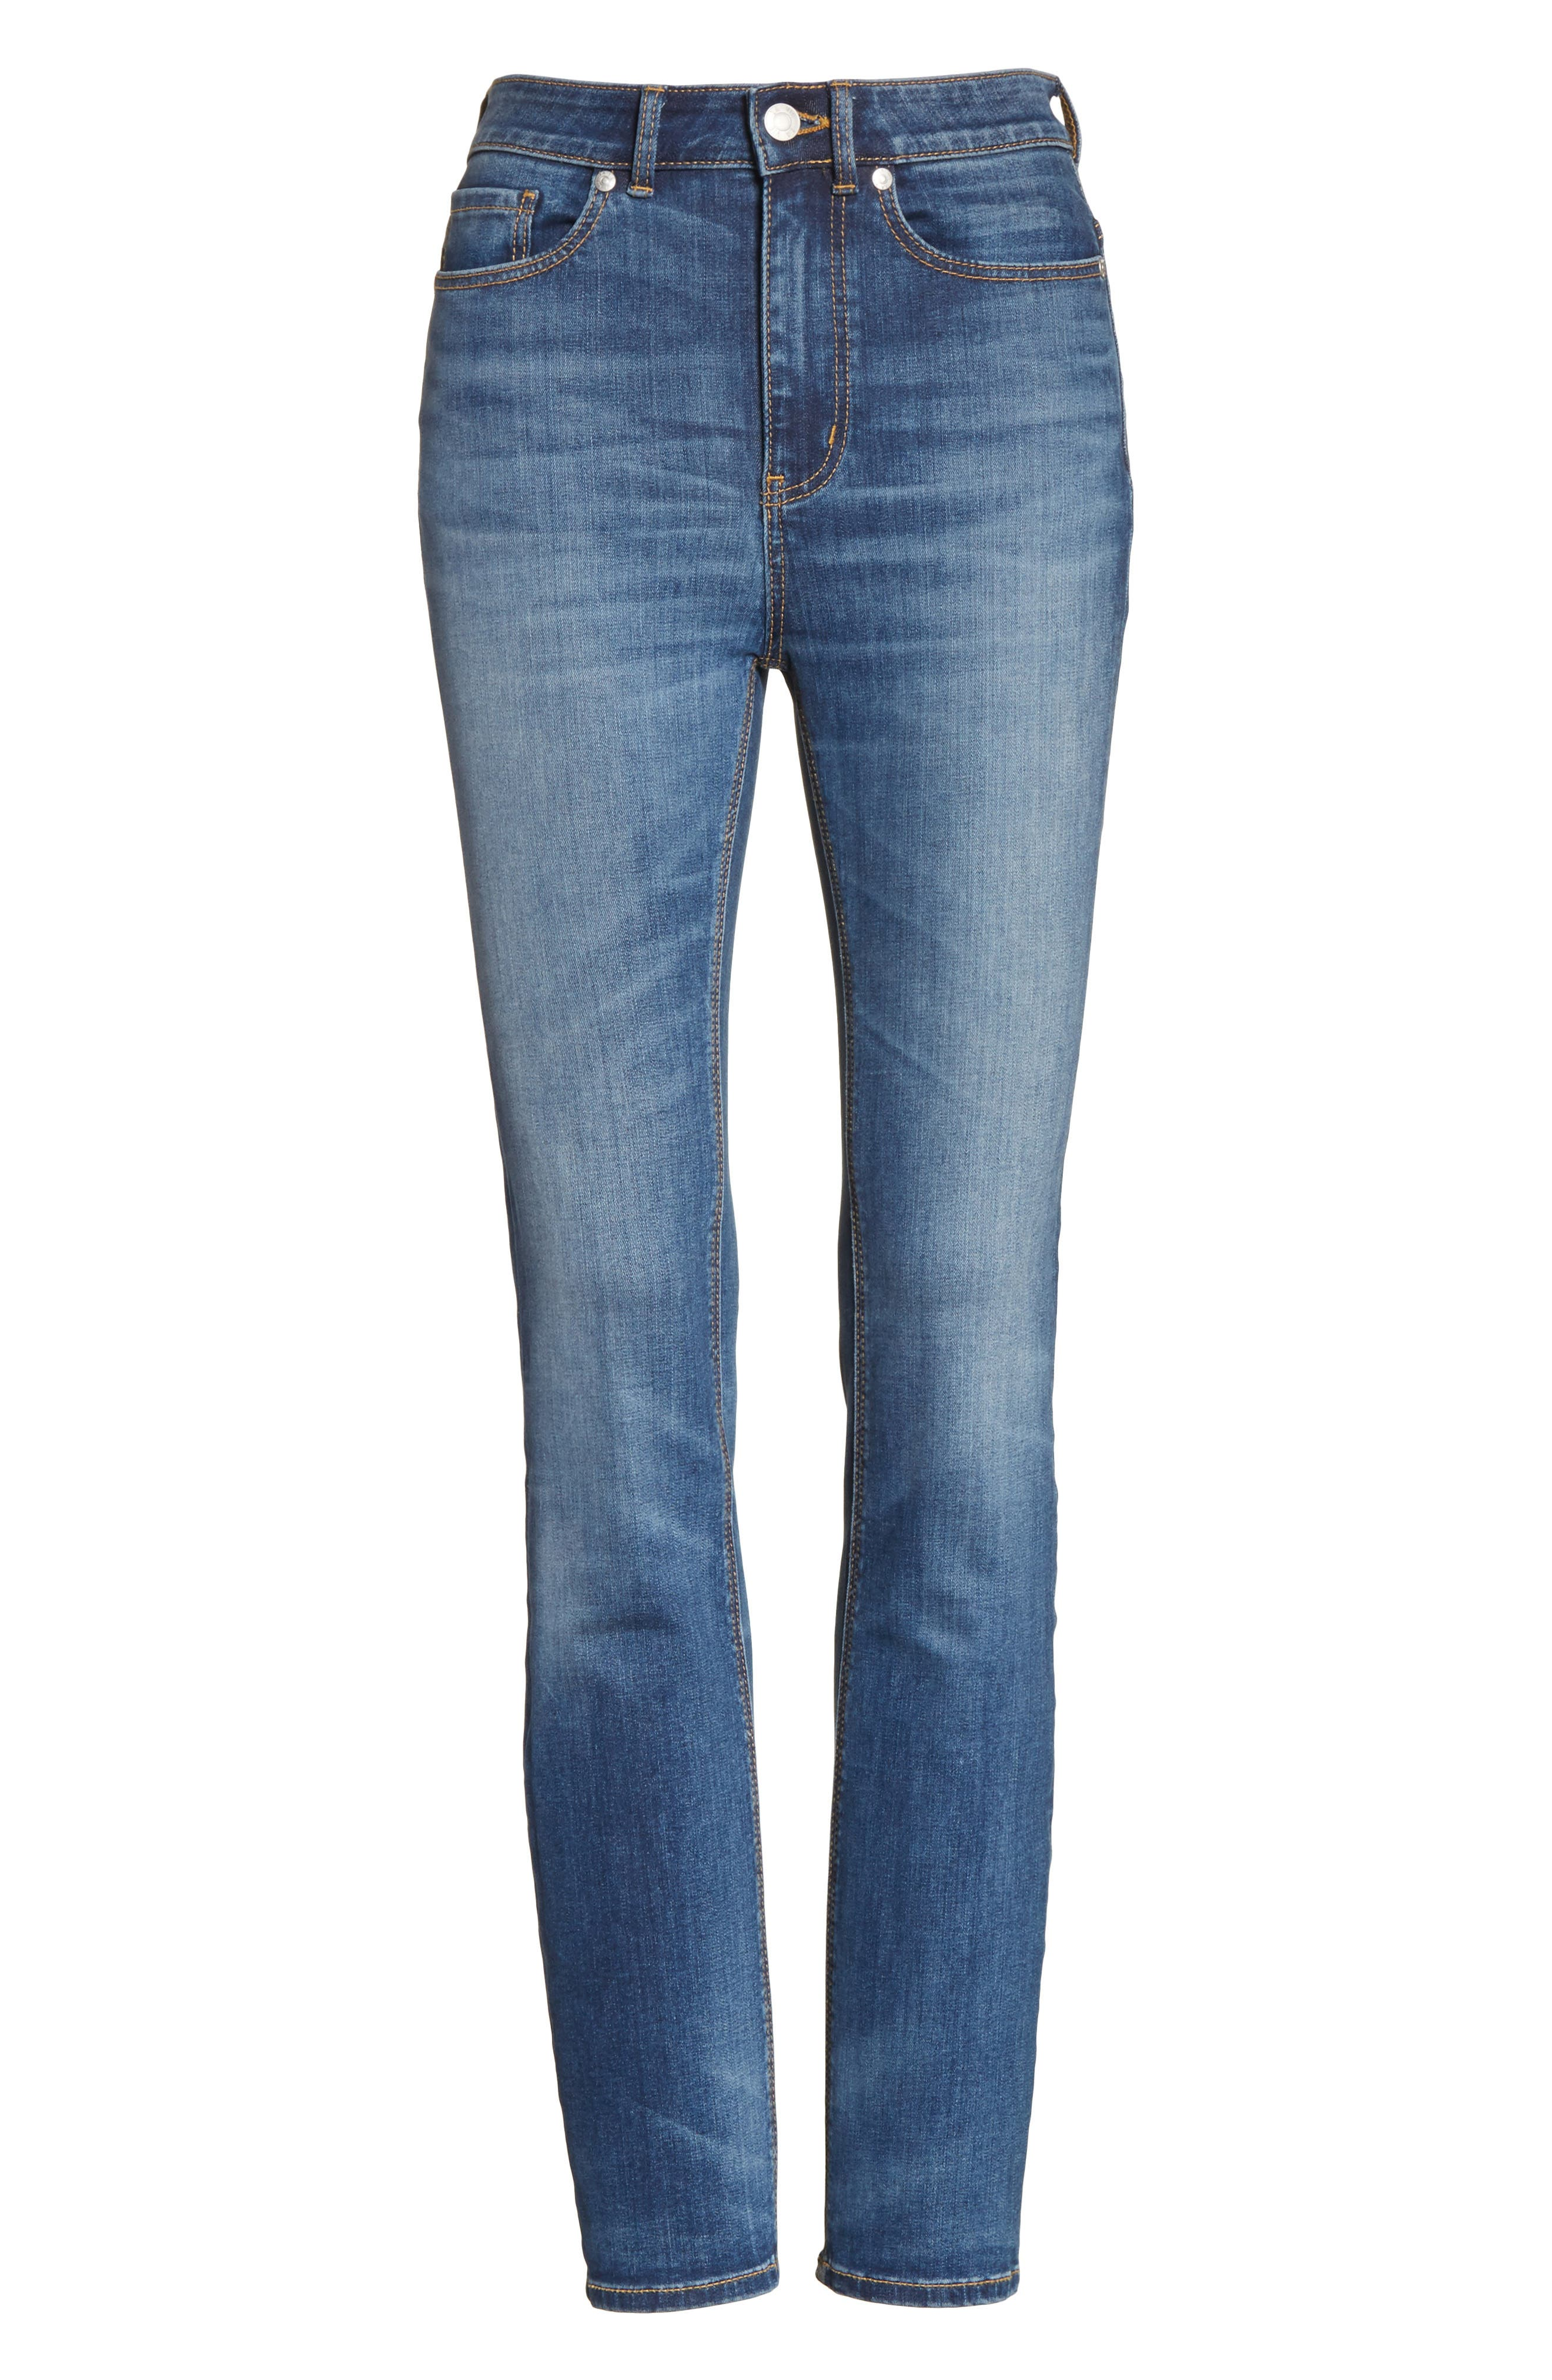 Clemence Skinny Jeans,                             Alternate thumbnail 6, color,                             401